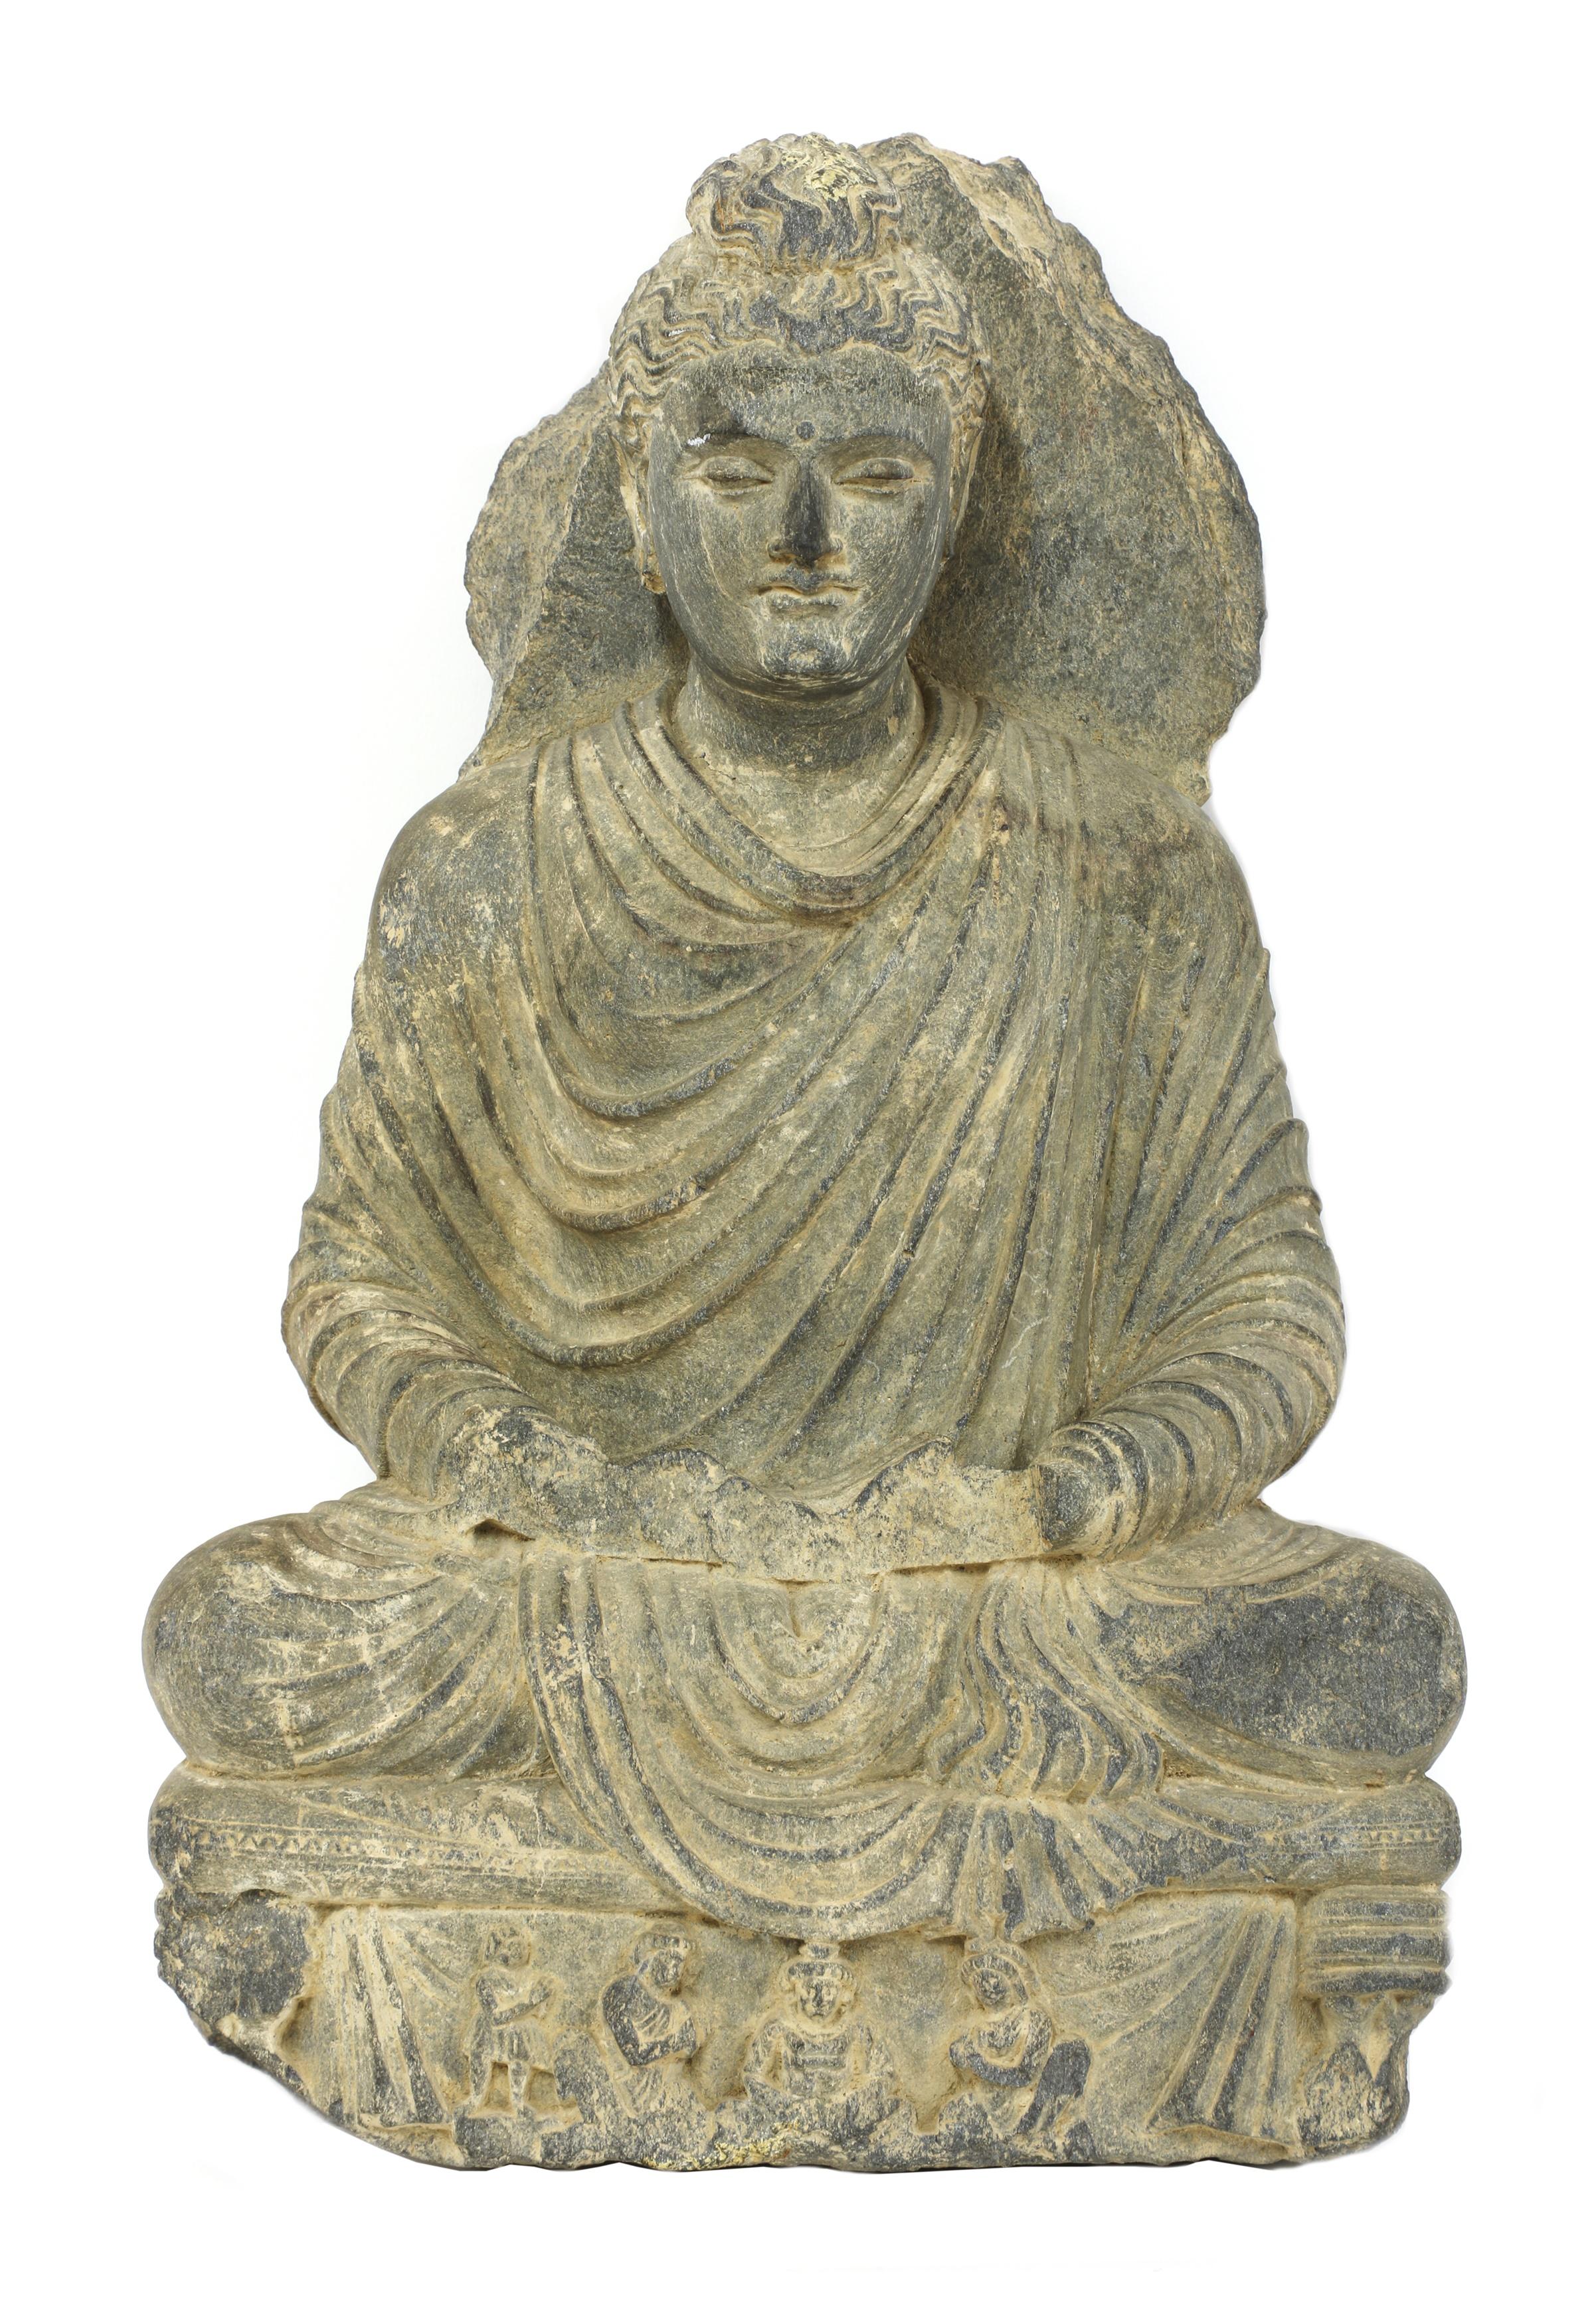 A Gandhara gray schist Buddha, 4th century